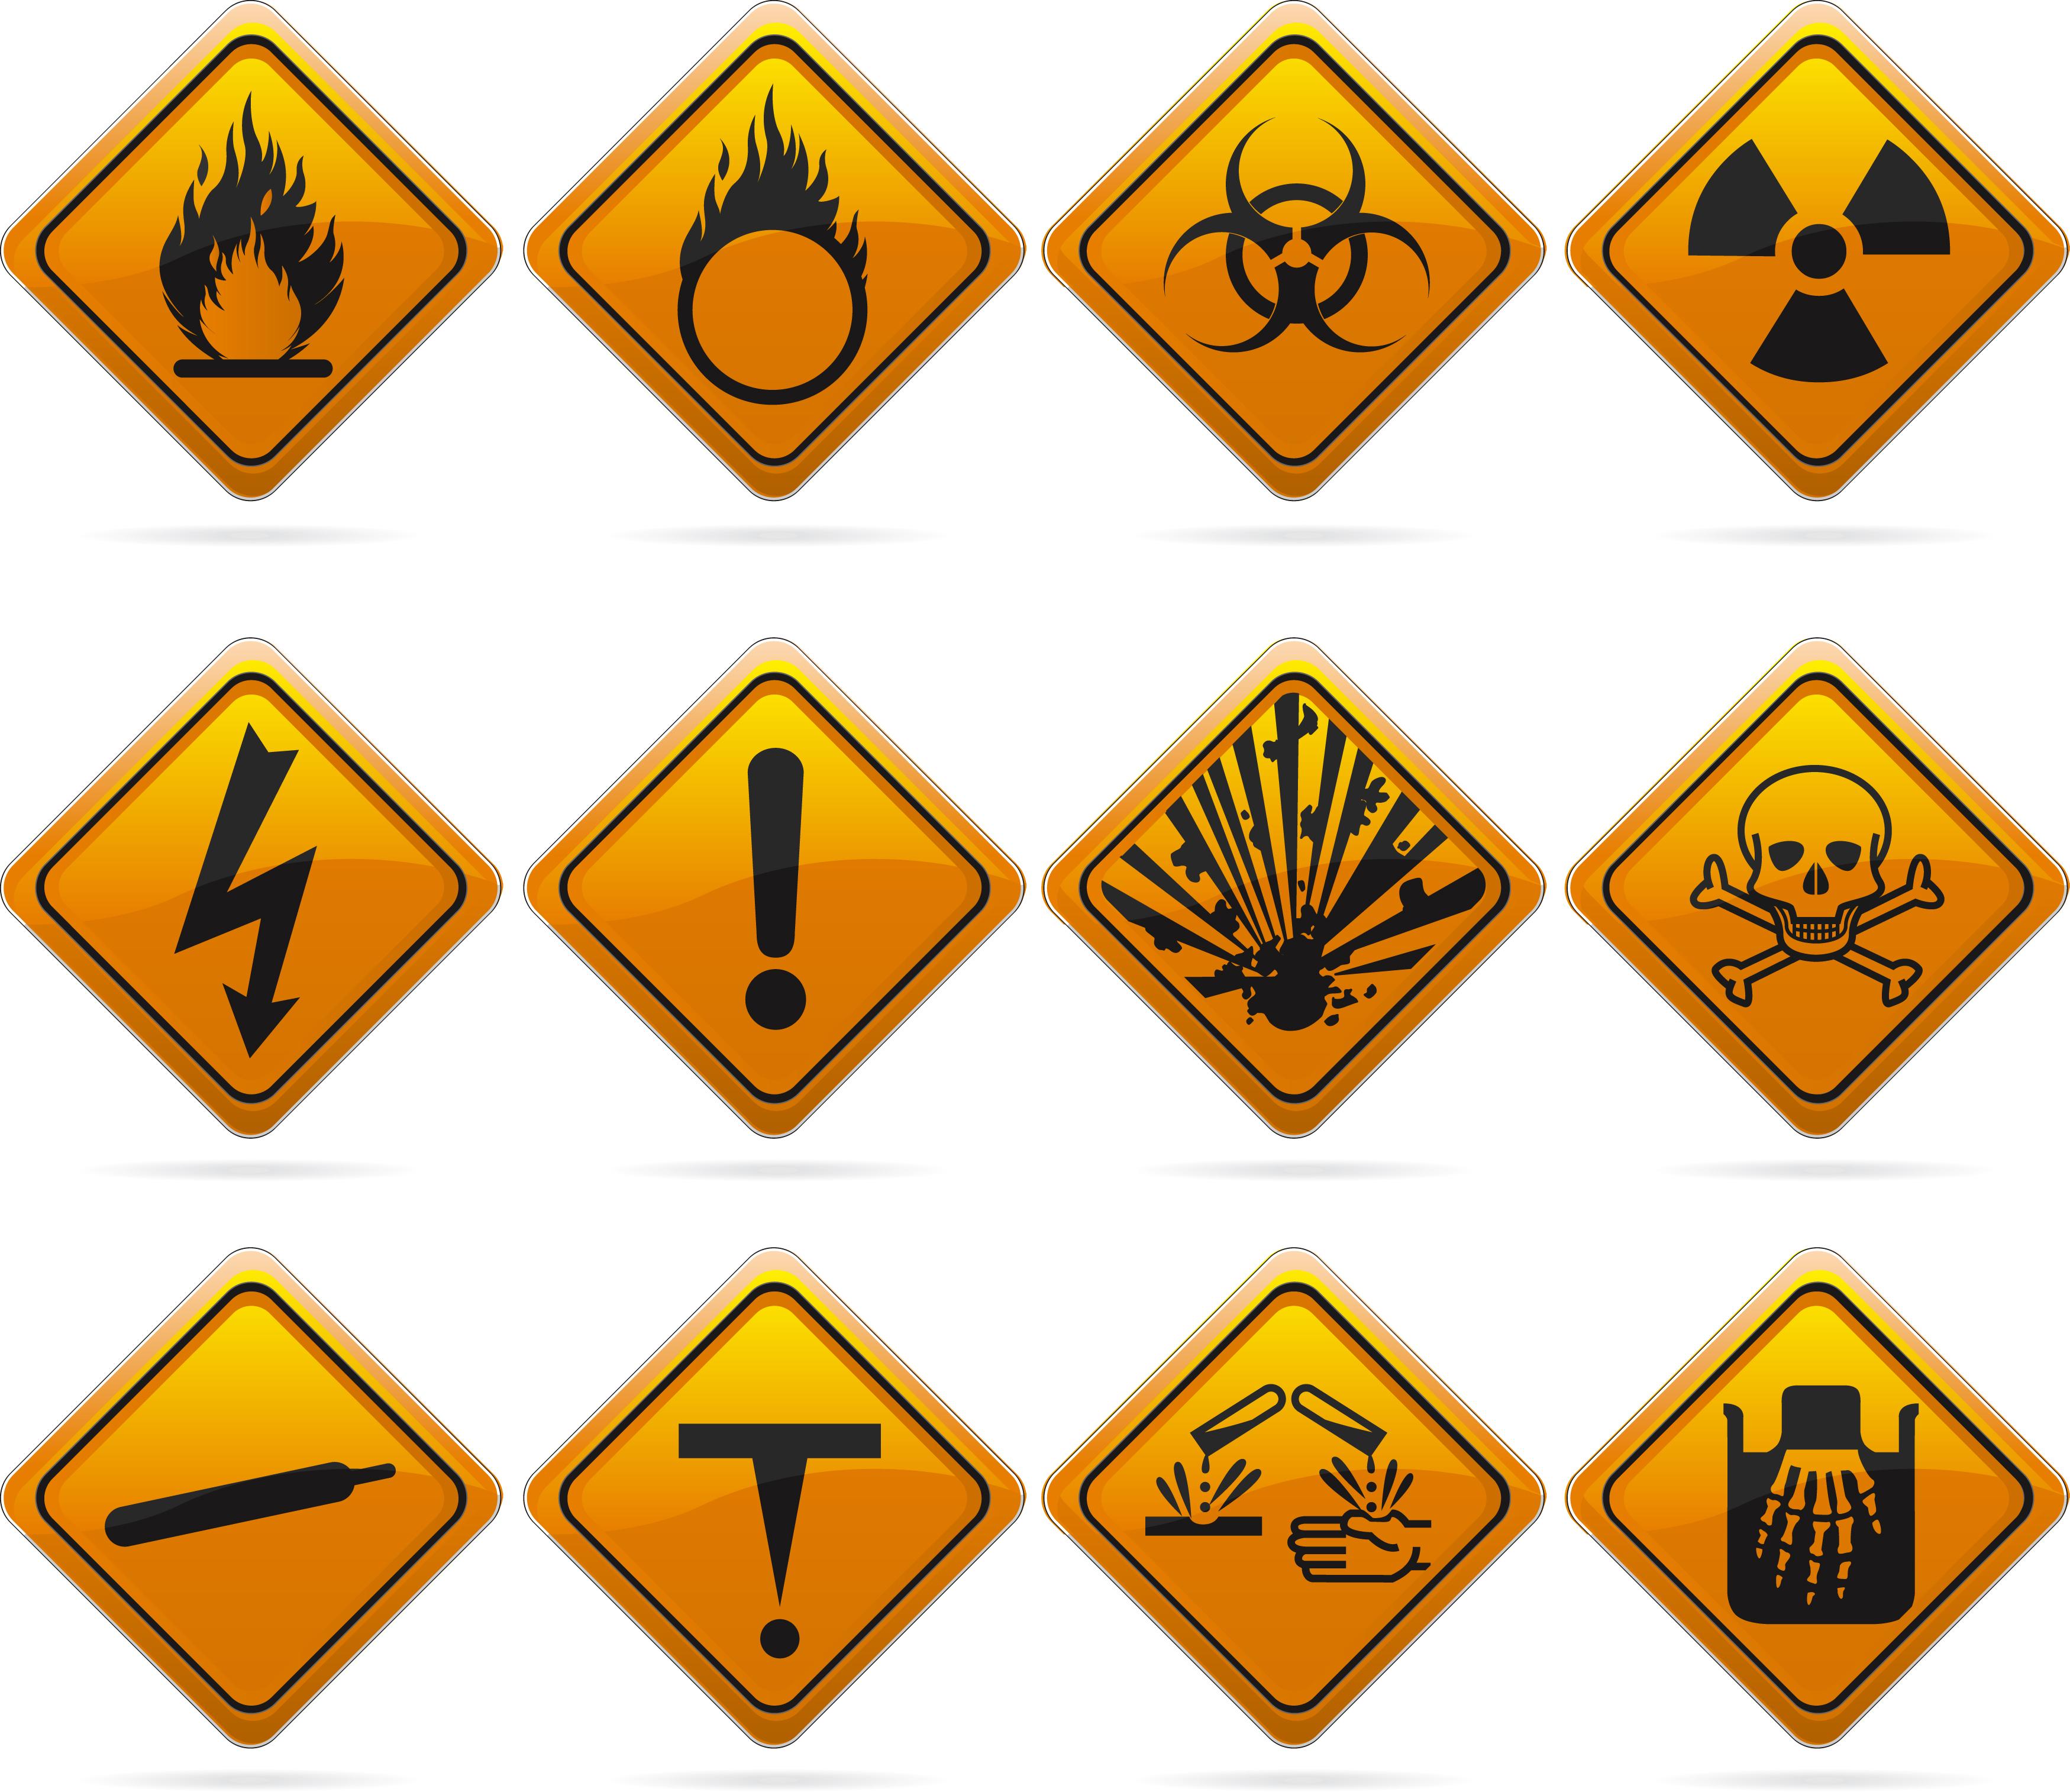 Chip hazard symbols image collections symbol and sign ideas chip hazard symbols health safety wiki chip hazard symbols buycottarizona image collections biocorpaavc Gallery